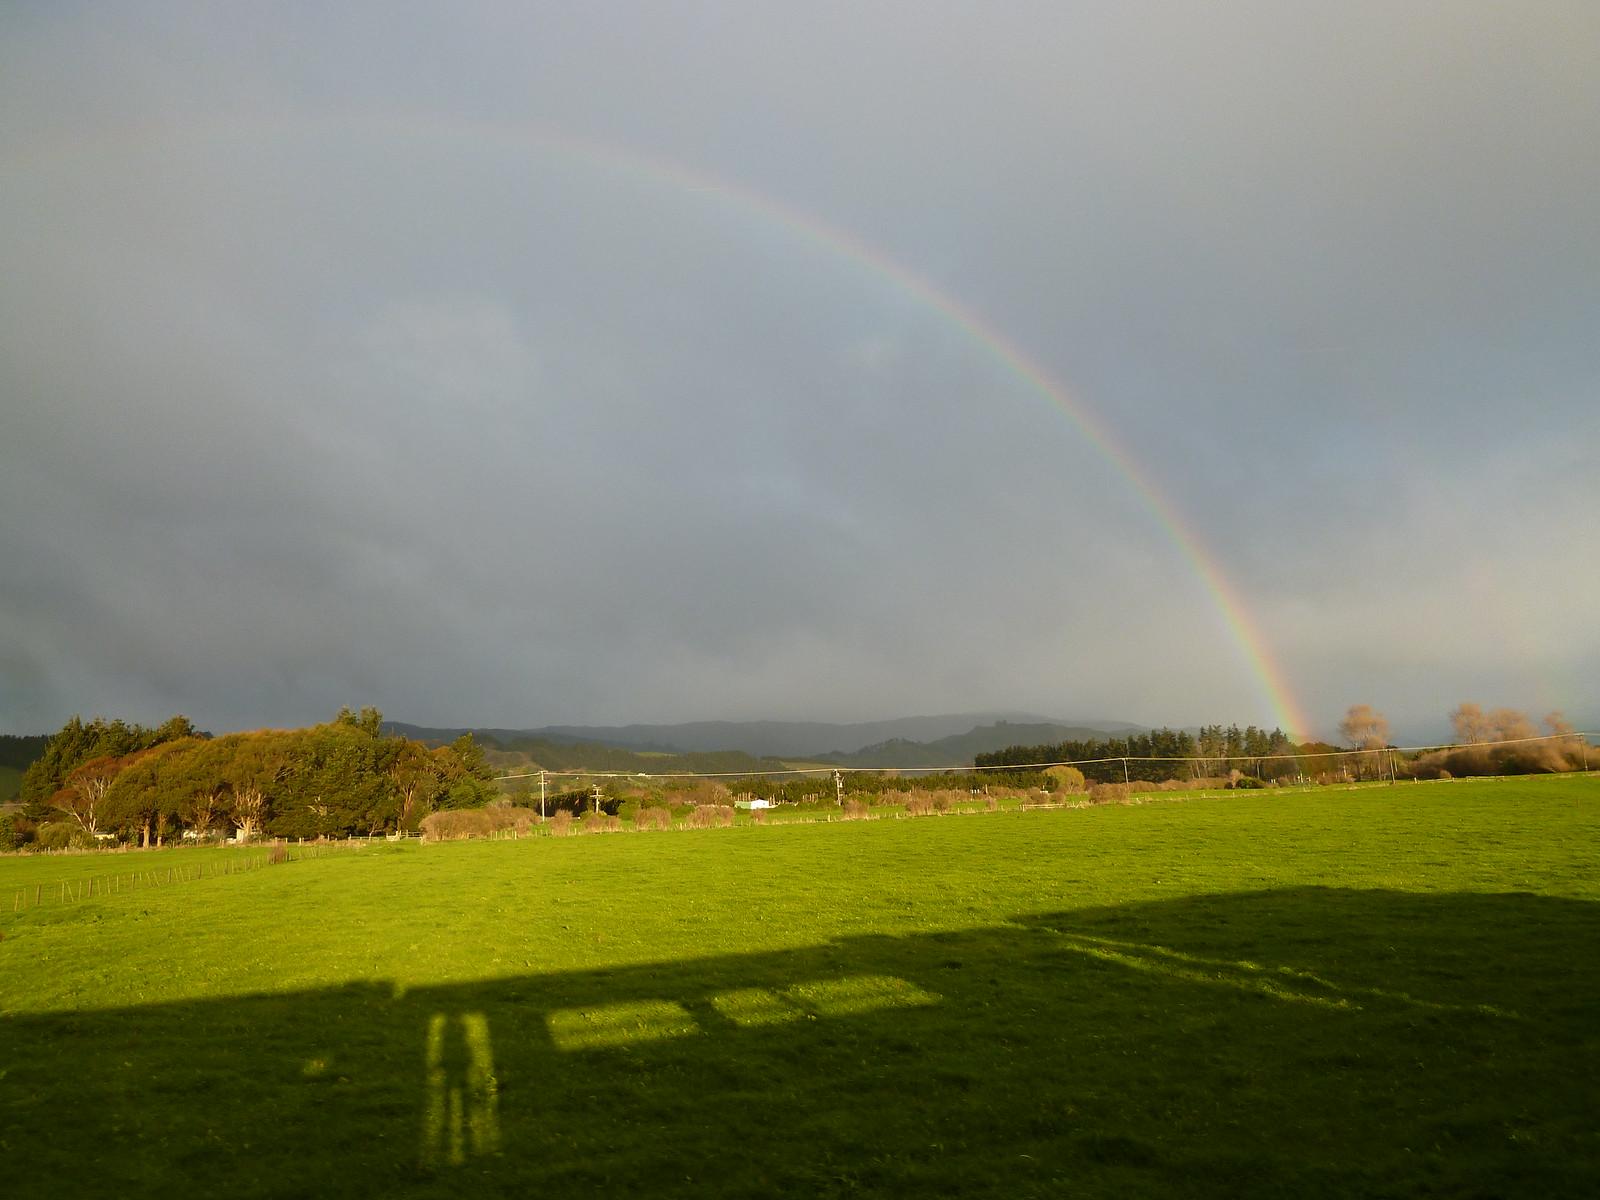 Chasing Rainbow :D